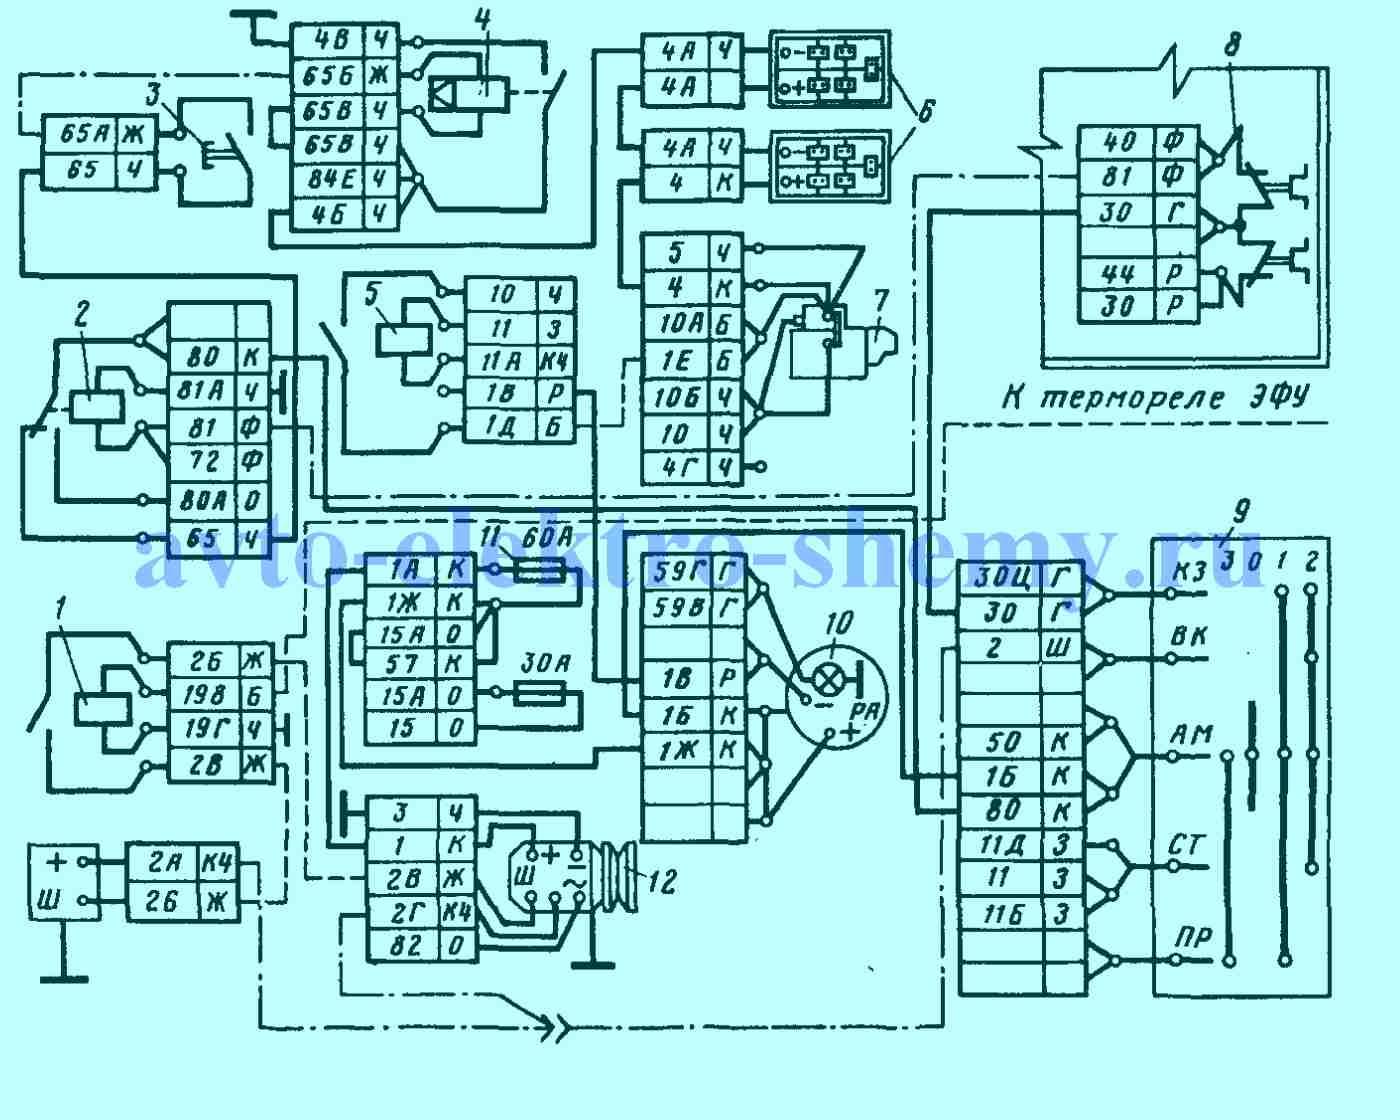 Потенциометр р 355 электрическая схема Схема электрическая принципиальная автомобиля камаз 6520...